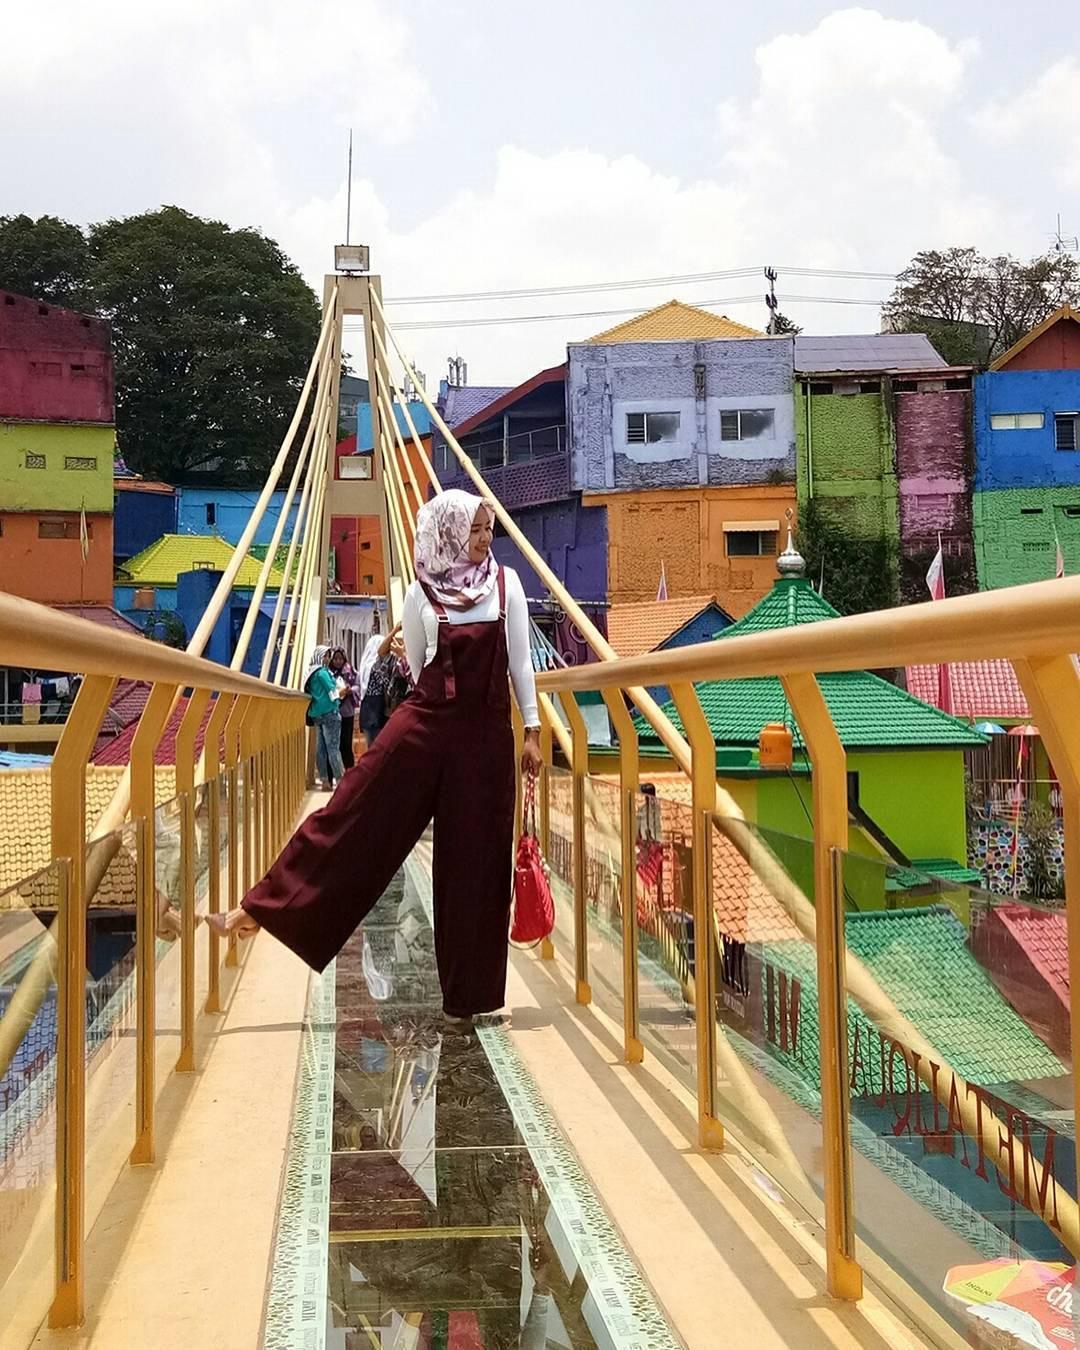 Kampung Warna Warni Jodipan Malang Punya Jembatan Kaca Unik Instagramable